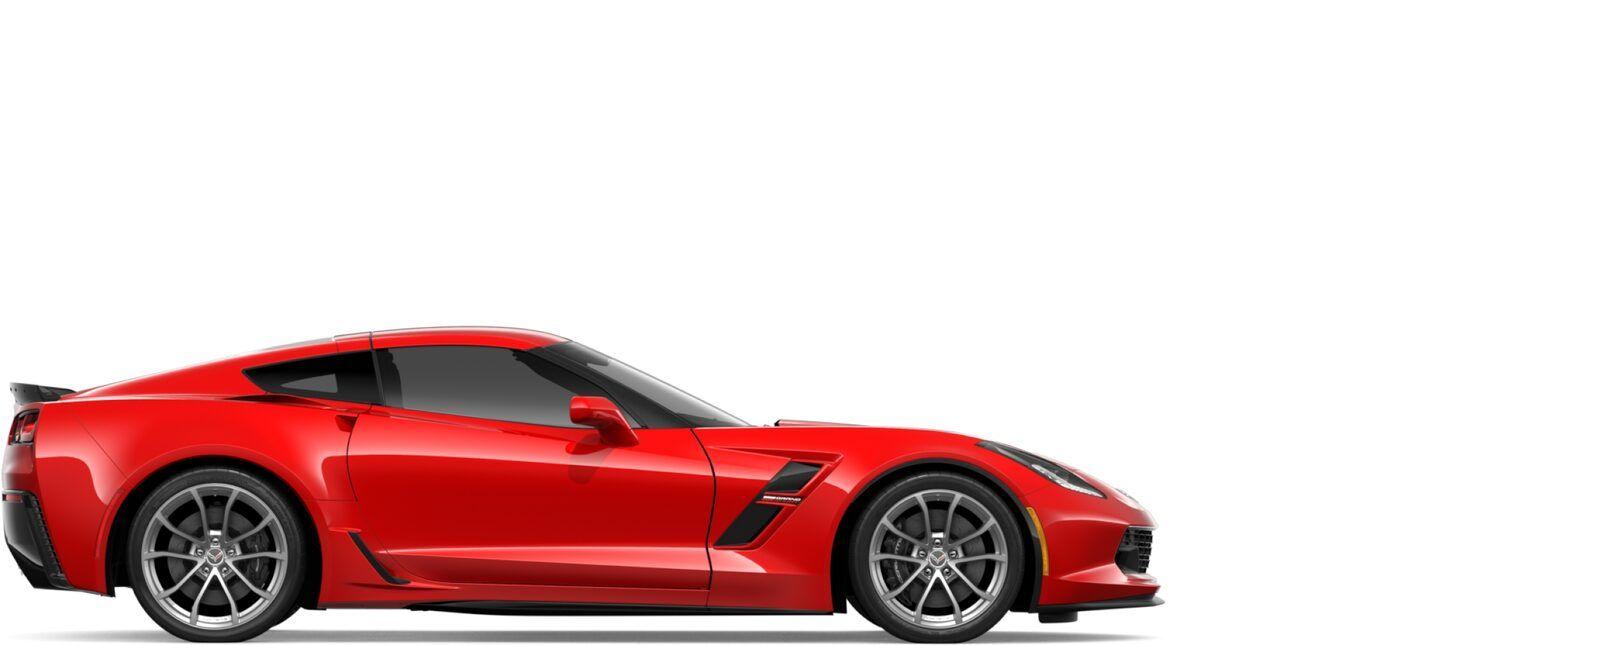 Chevrolet Betriebsanleitung | Chevrolet Schweiz